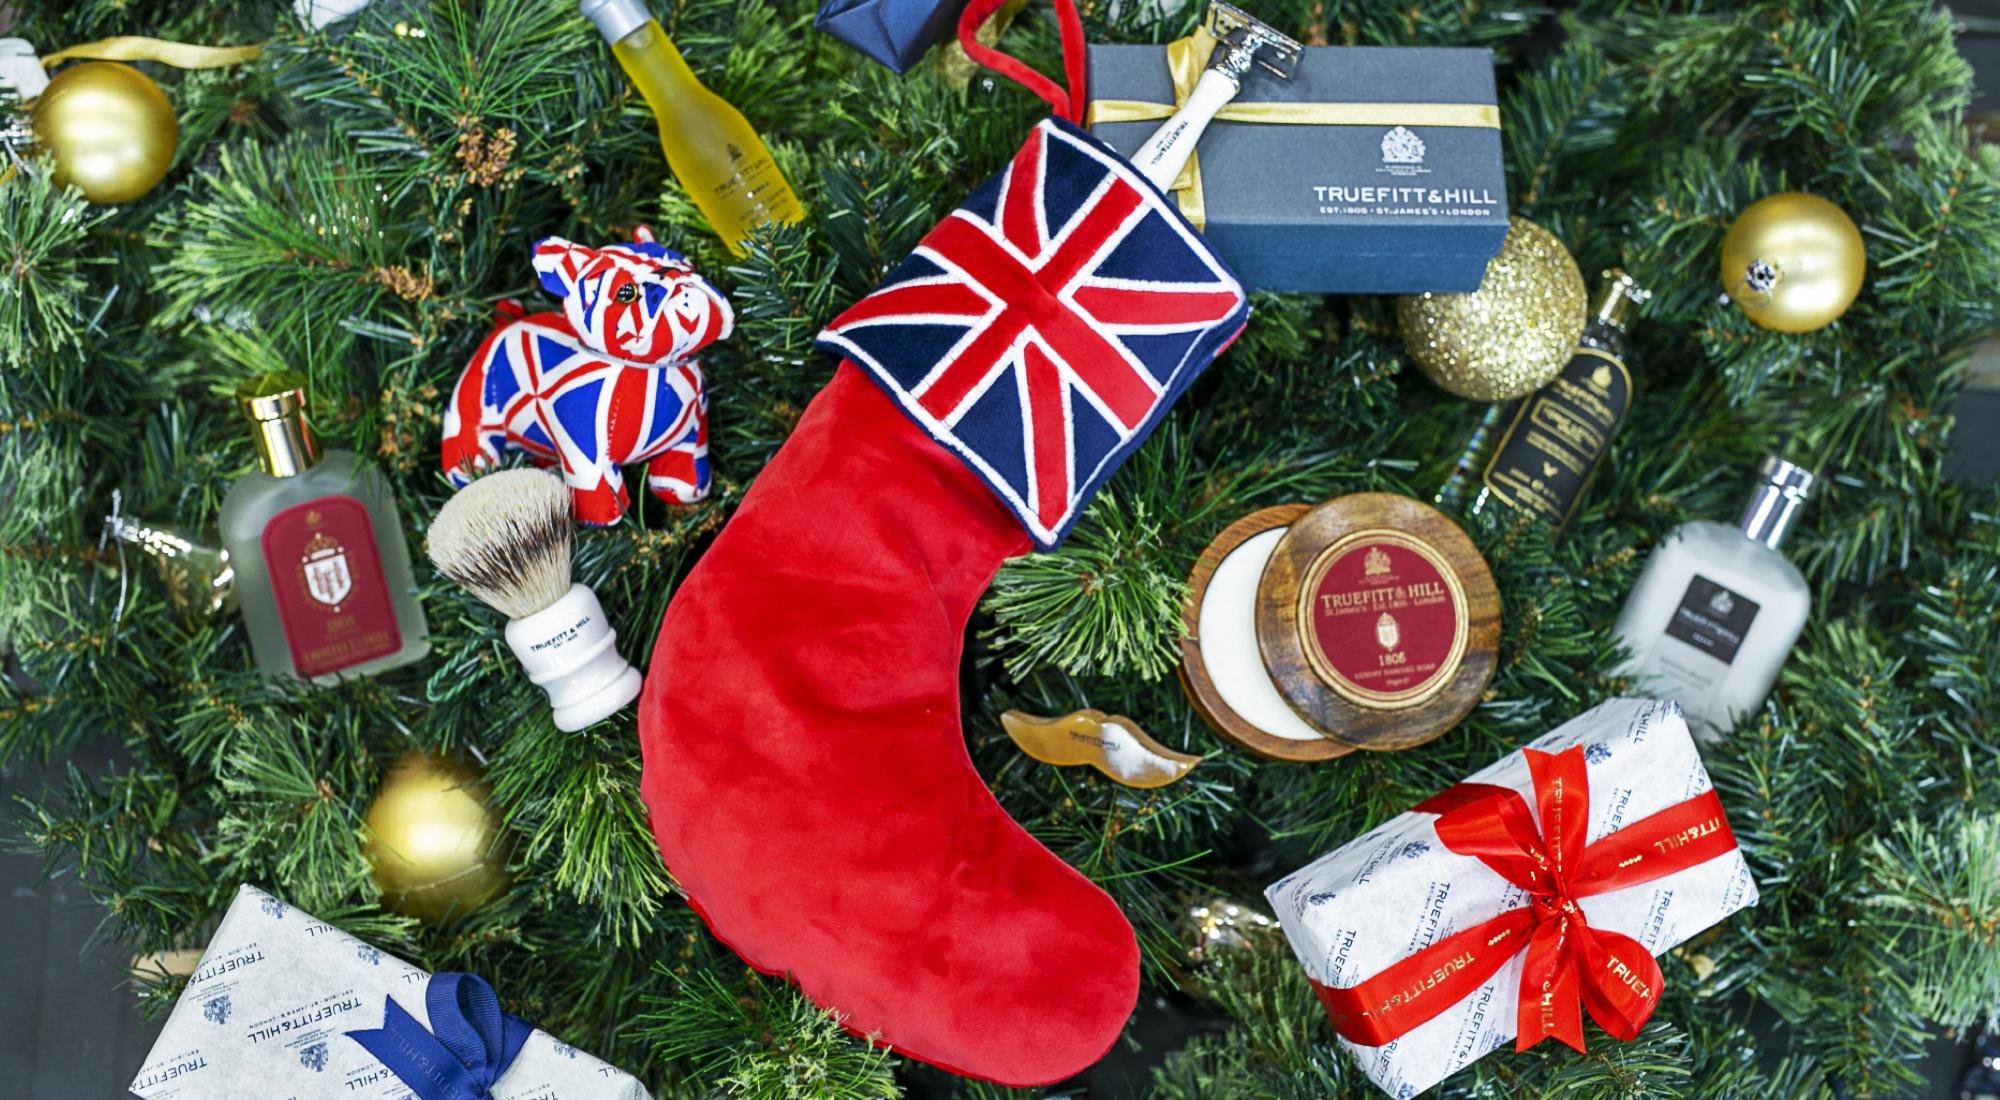 Truefitt & Hill's gift for you this festive season